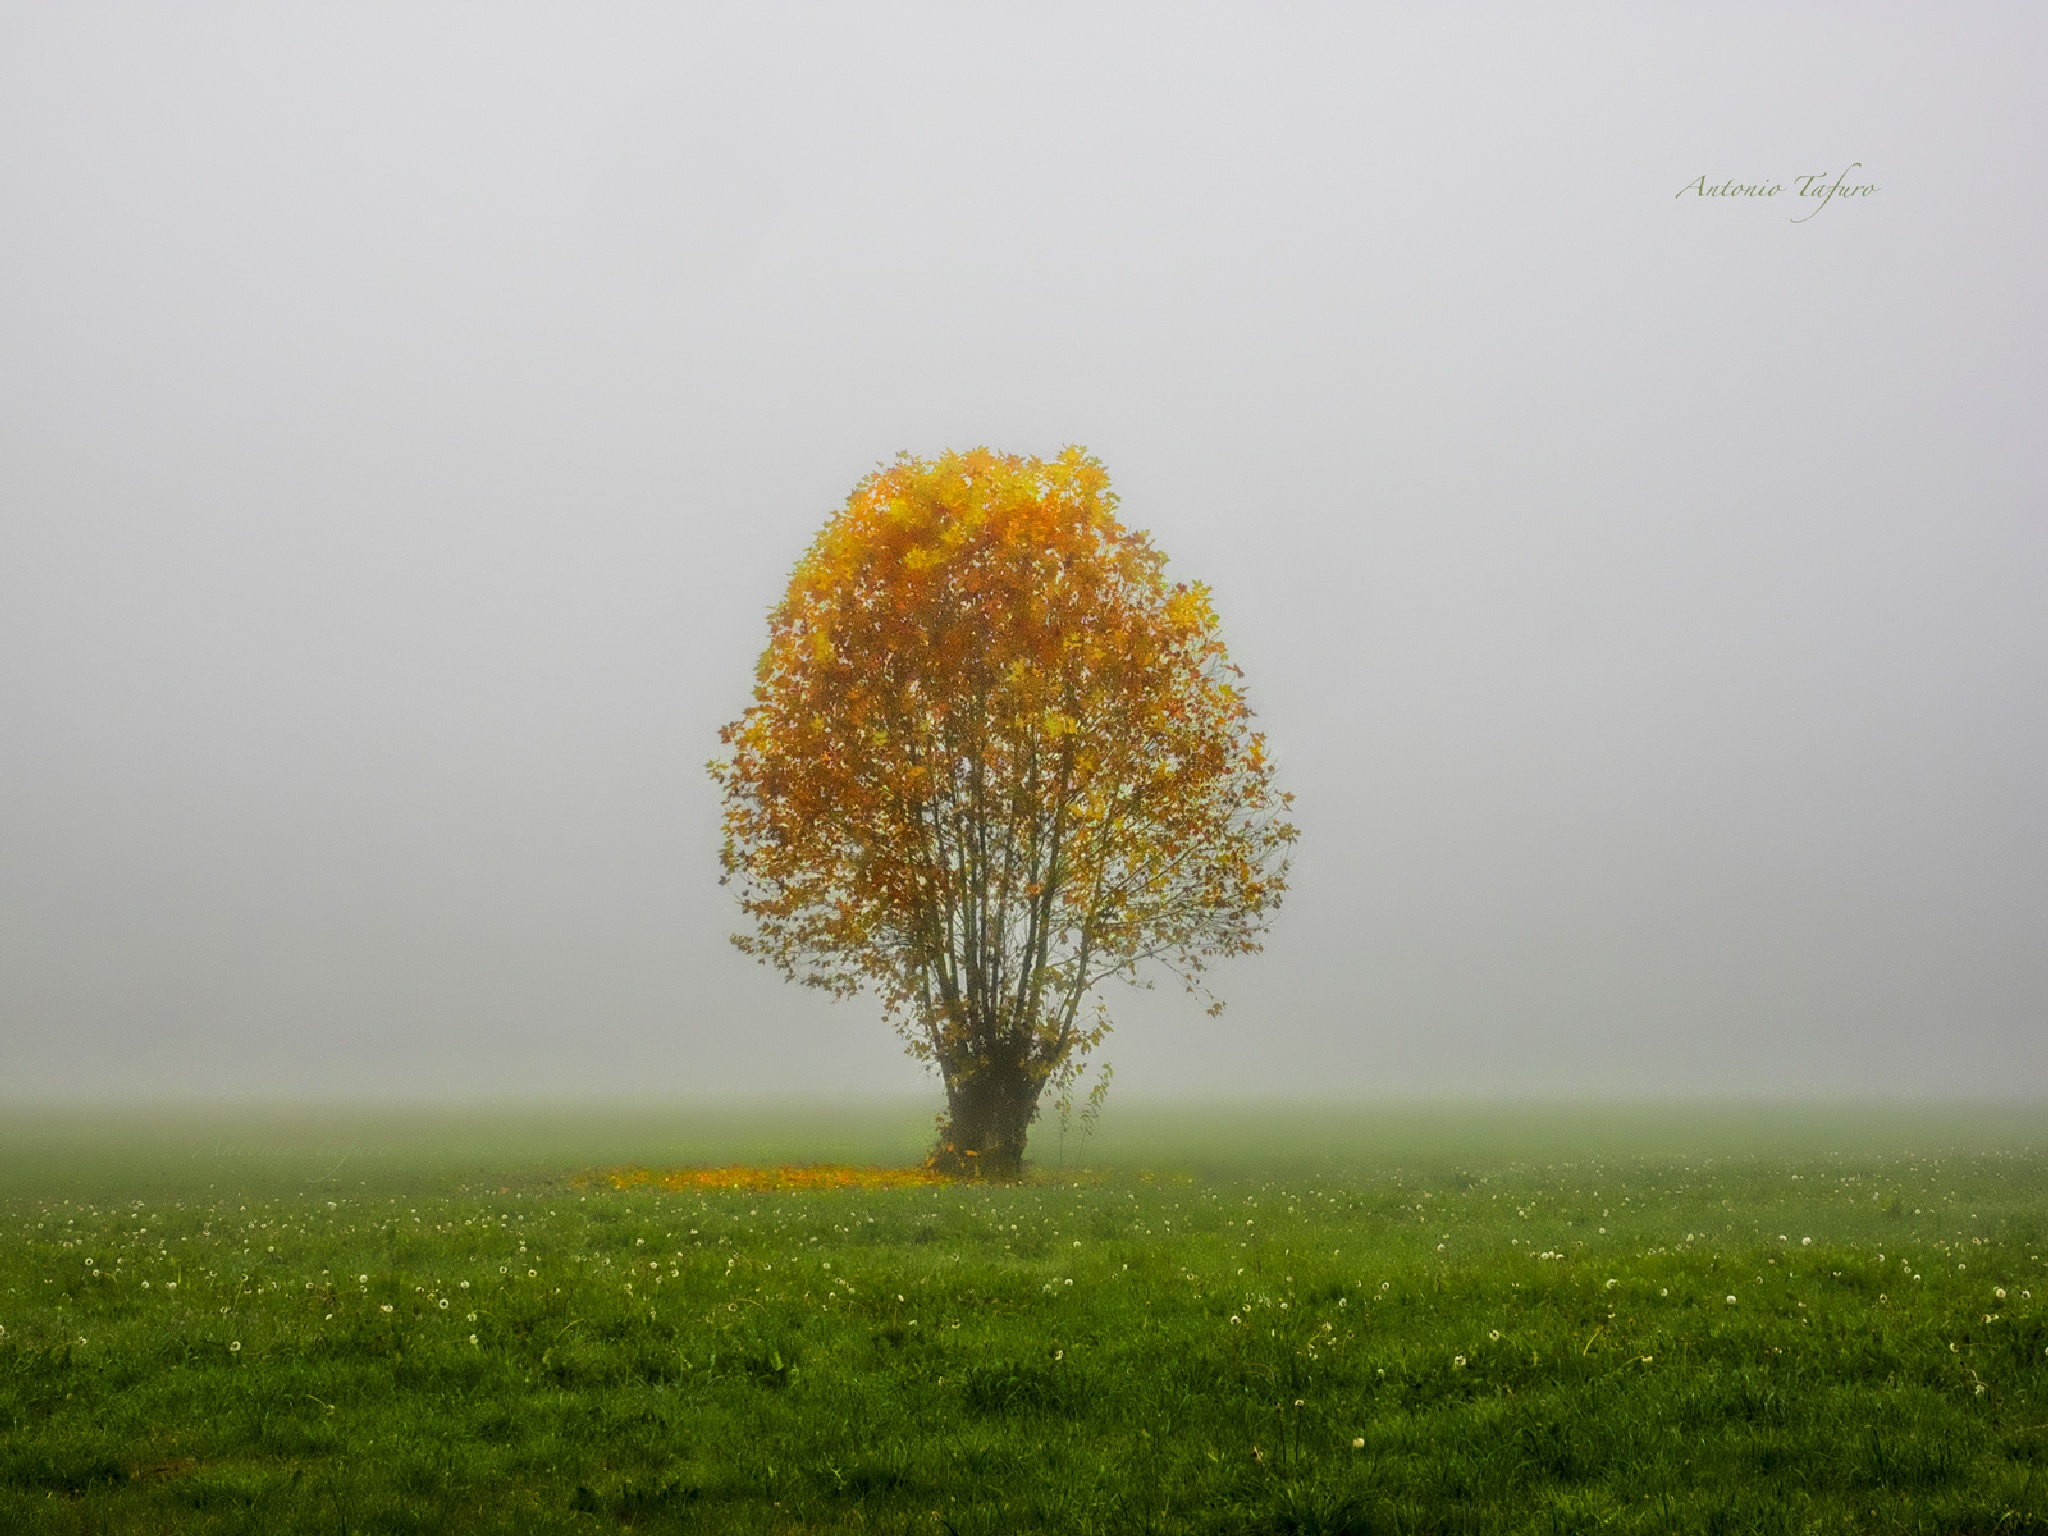 tree in the mist by Antonio Tafuro